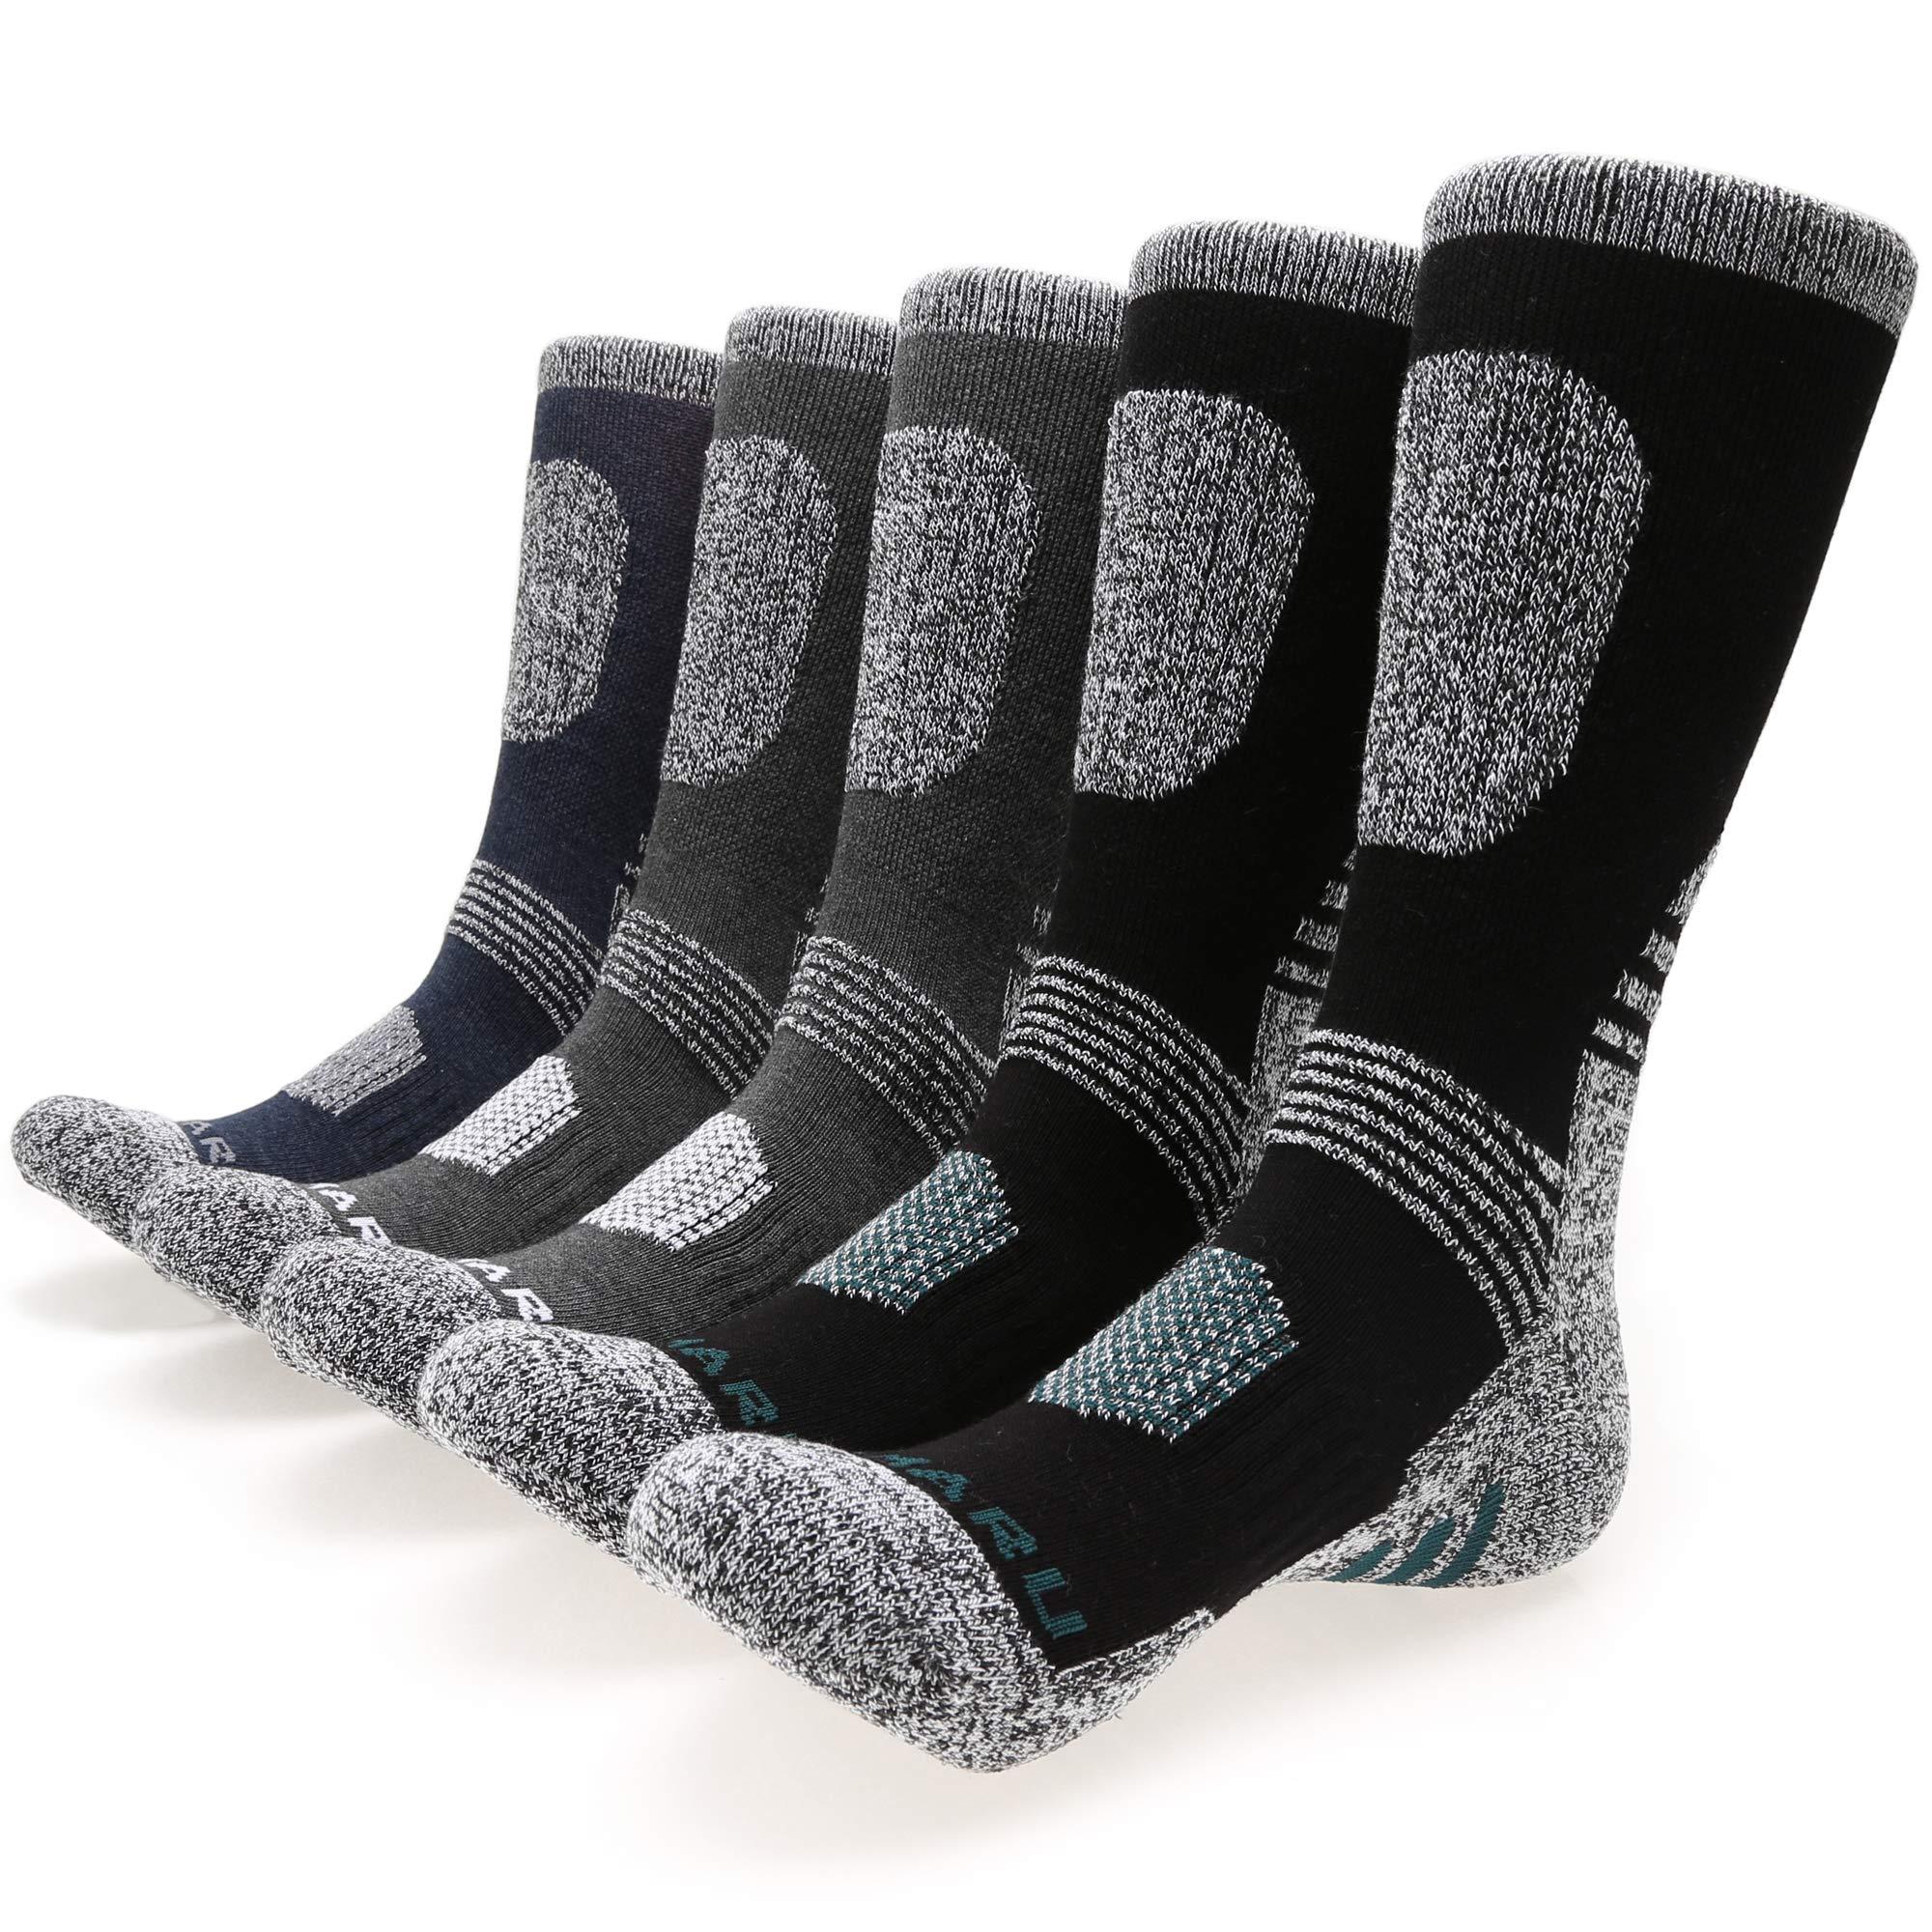 MIRMARU Men's 5 Pairs Hiking Socks- Multi Performance Moisture Wicking Outdoor Sports Hiking Crew Socks